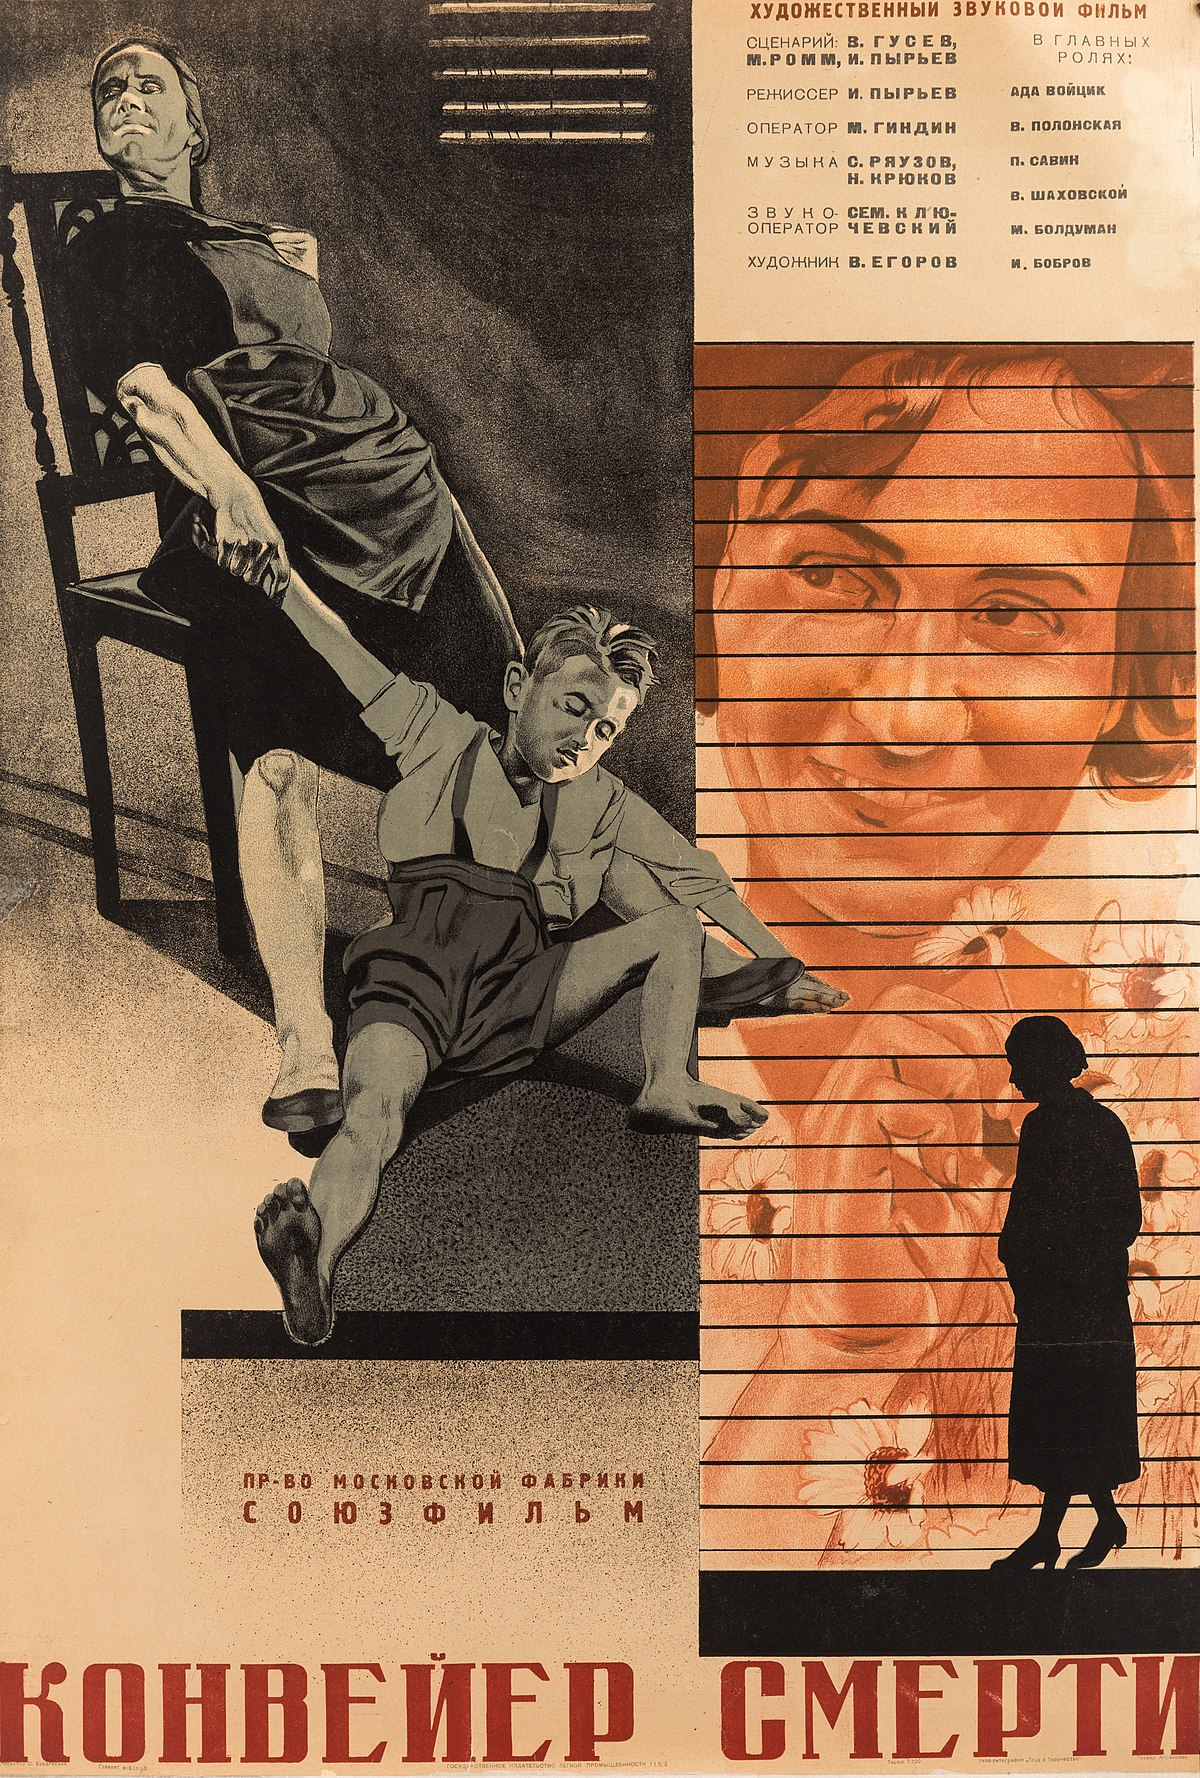 Конвейер смерти фильм 1985 кто из певцов работал на элеваторе в молодости фото